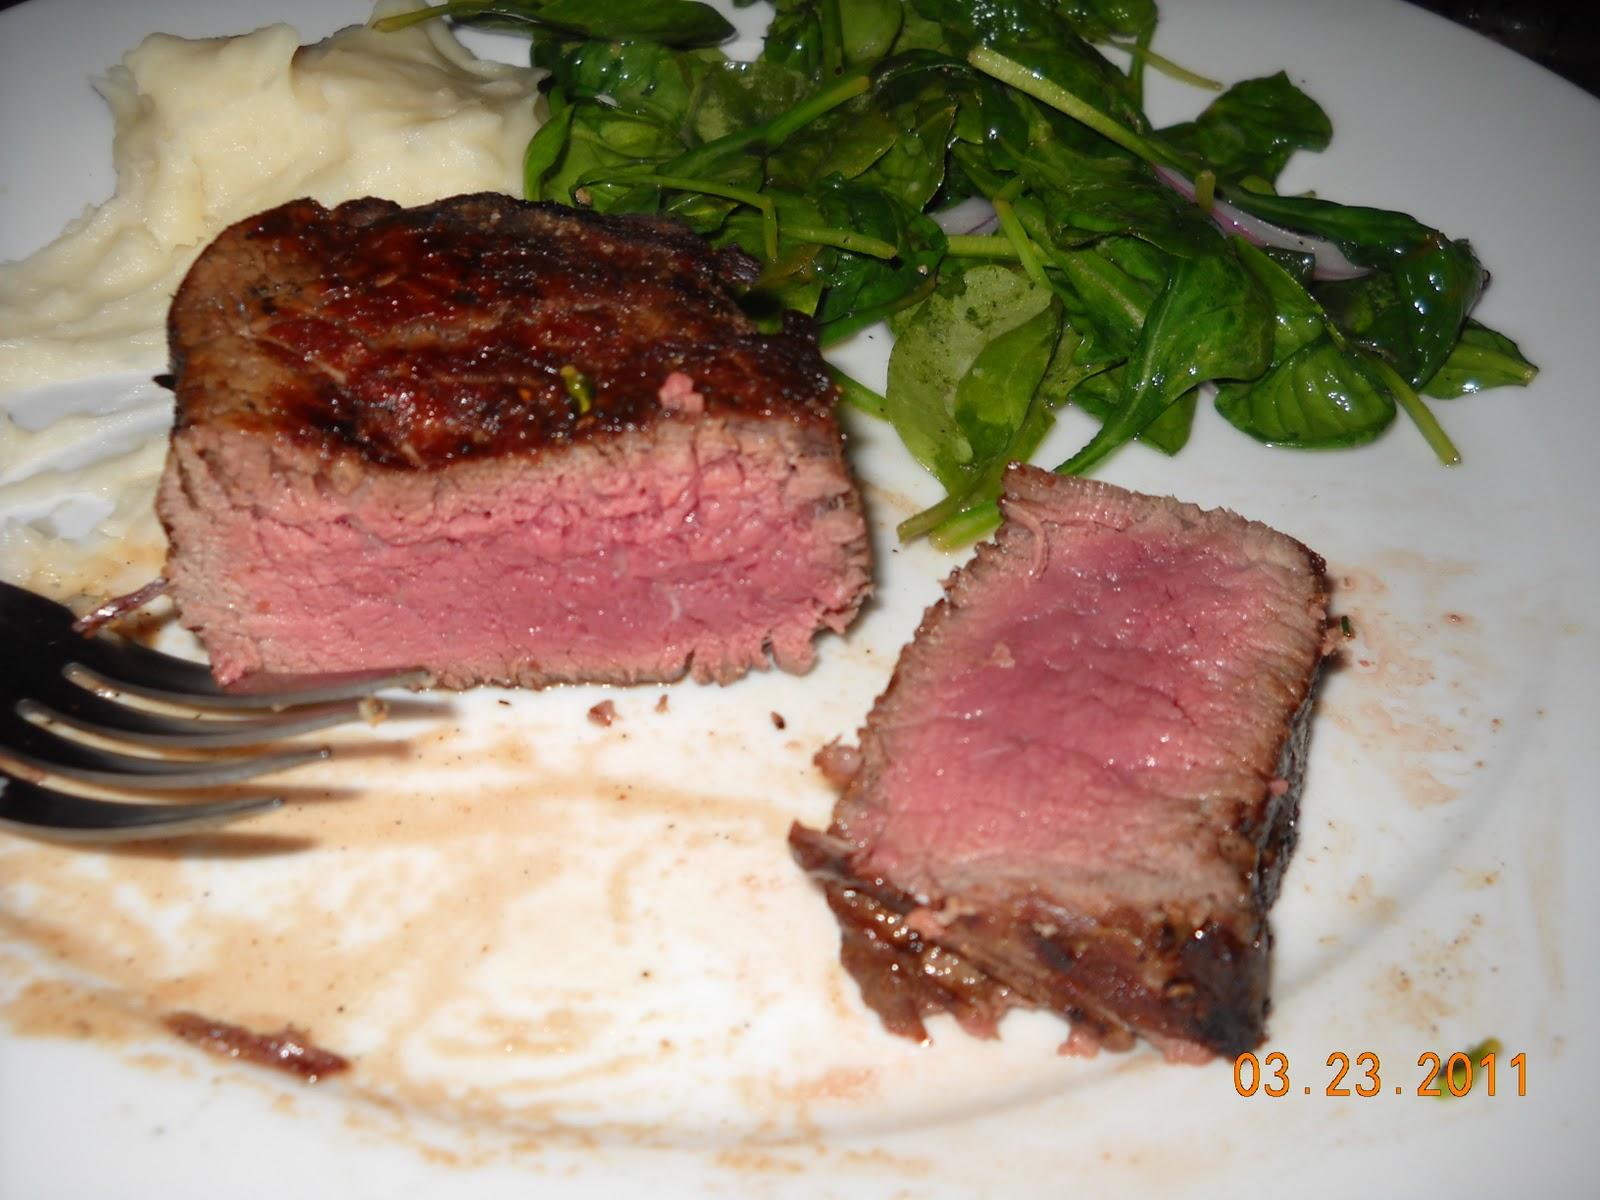 Filet Mignon Medium Well | www.imgkid.com - The Image Kid ...